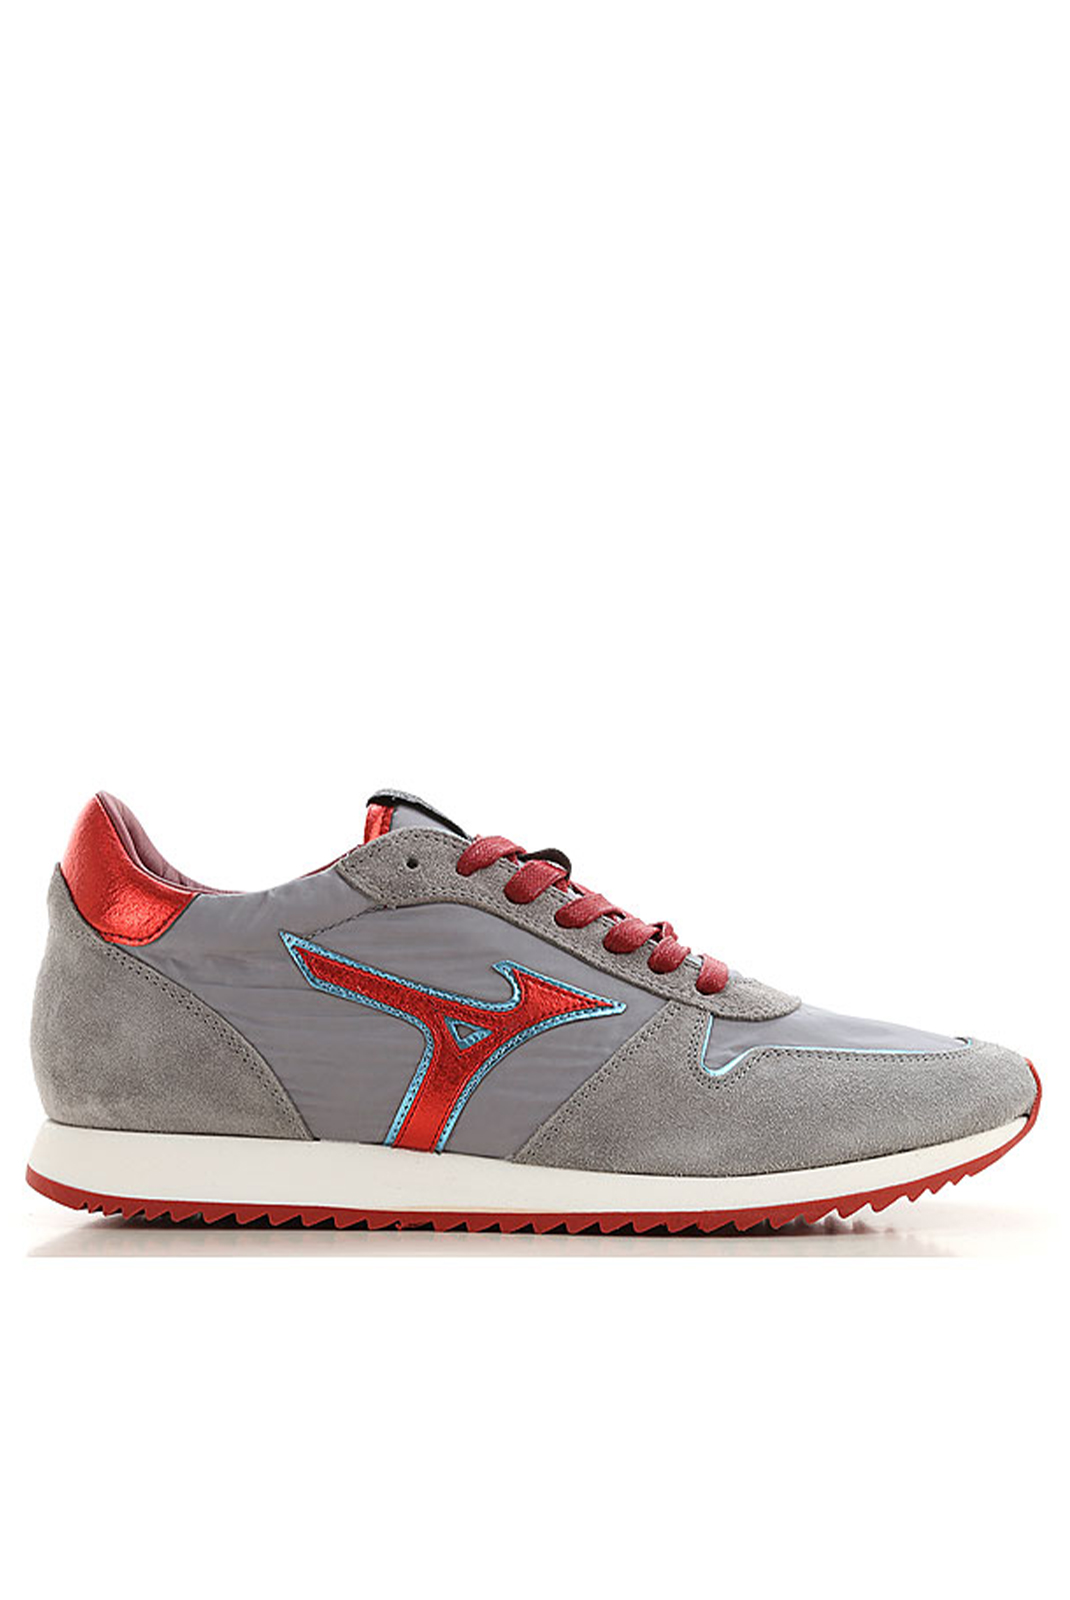 Chaussures   Mizuno D1GE181262 ETAMIN 2 ETAMIN 2 BA RED/GREY/GREY